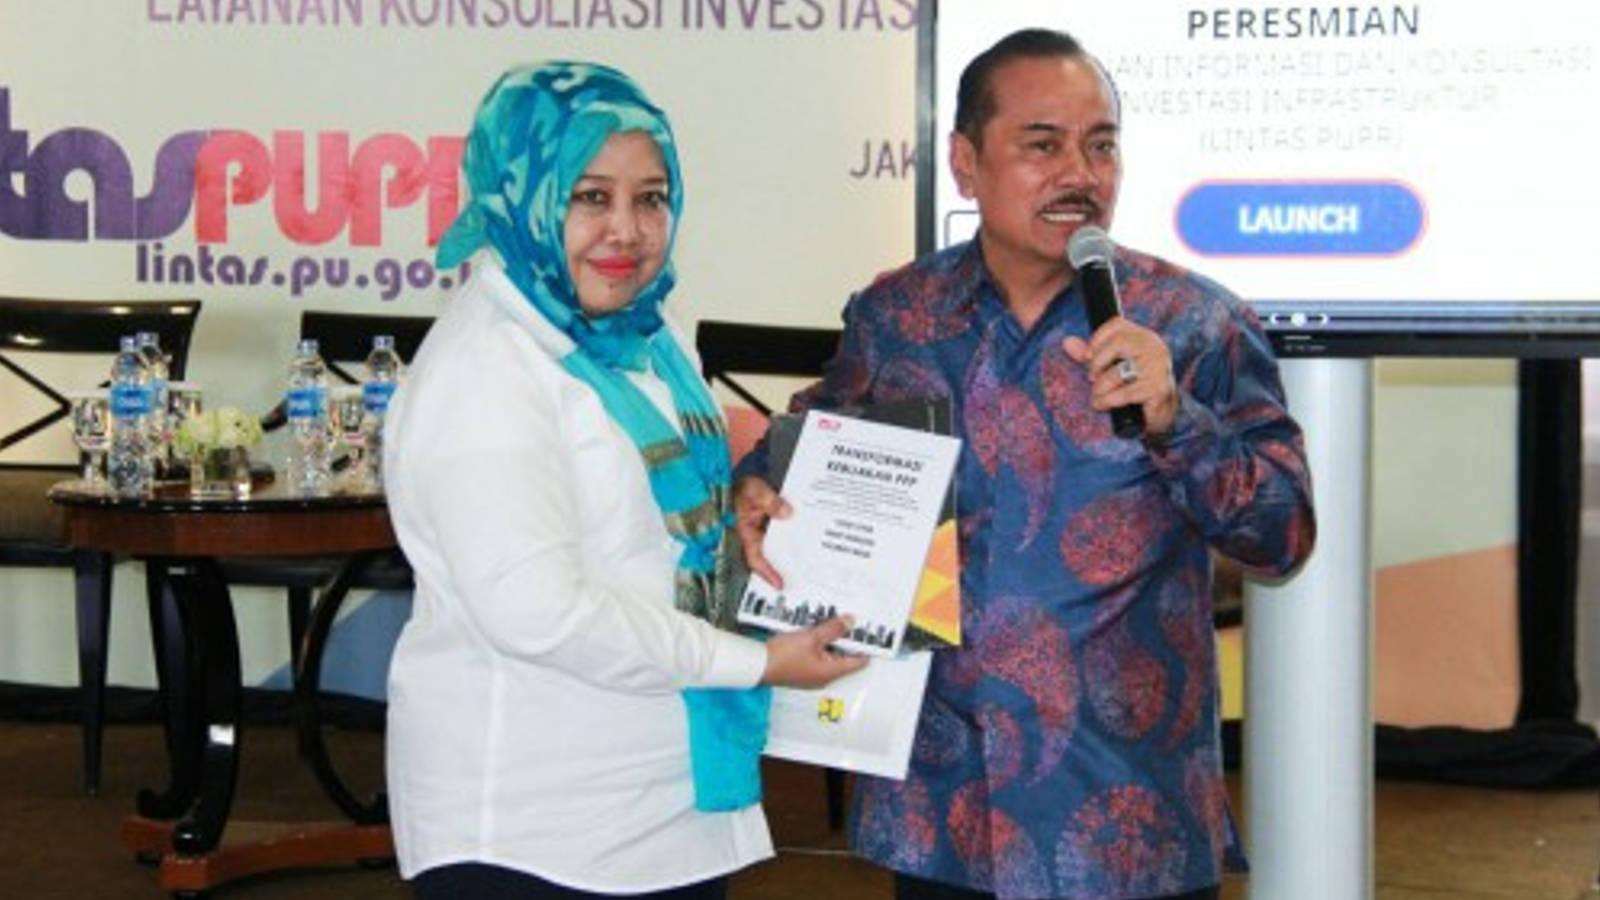 Kementerian PUPR Luncurkan Situs Layanan Konsultasi Investasi Infrastruktur